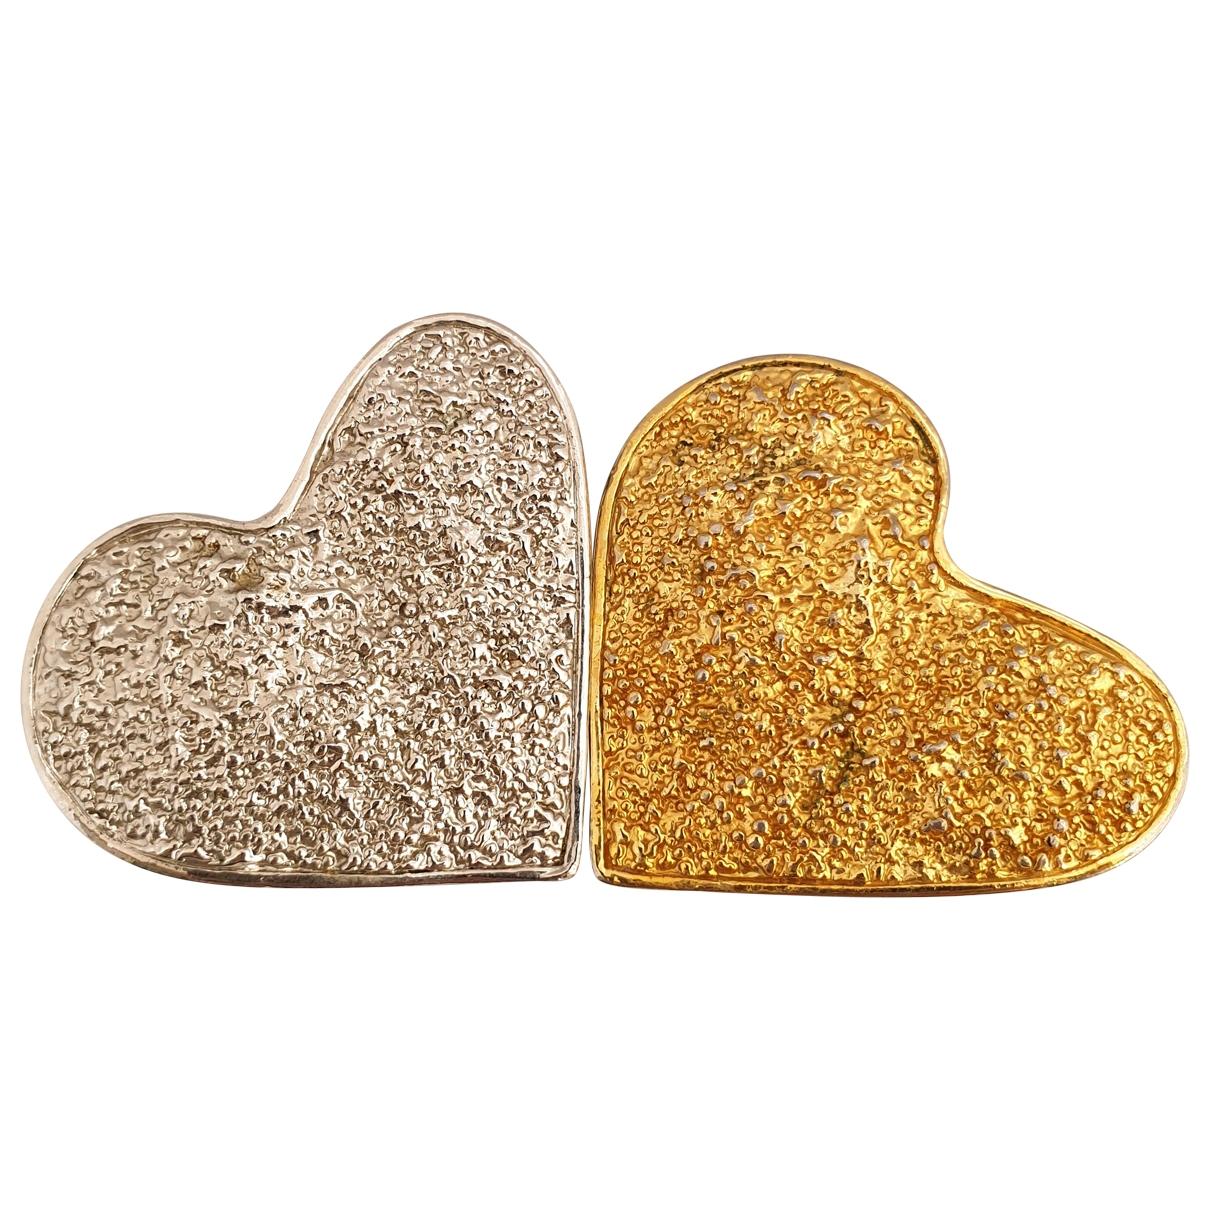 Broche Motifs Coeurs en Metal Dorado Non Signe / Unsigned